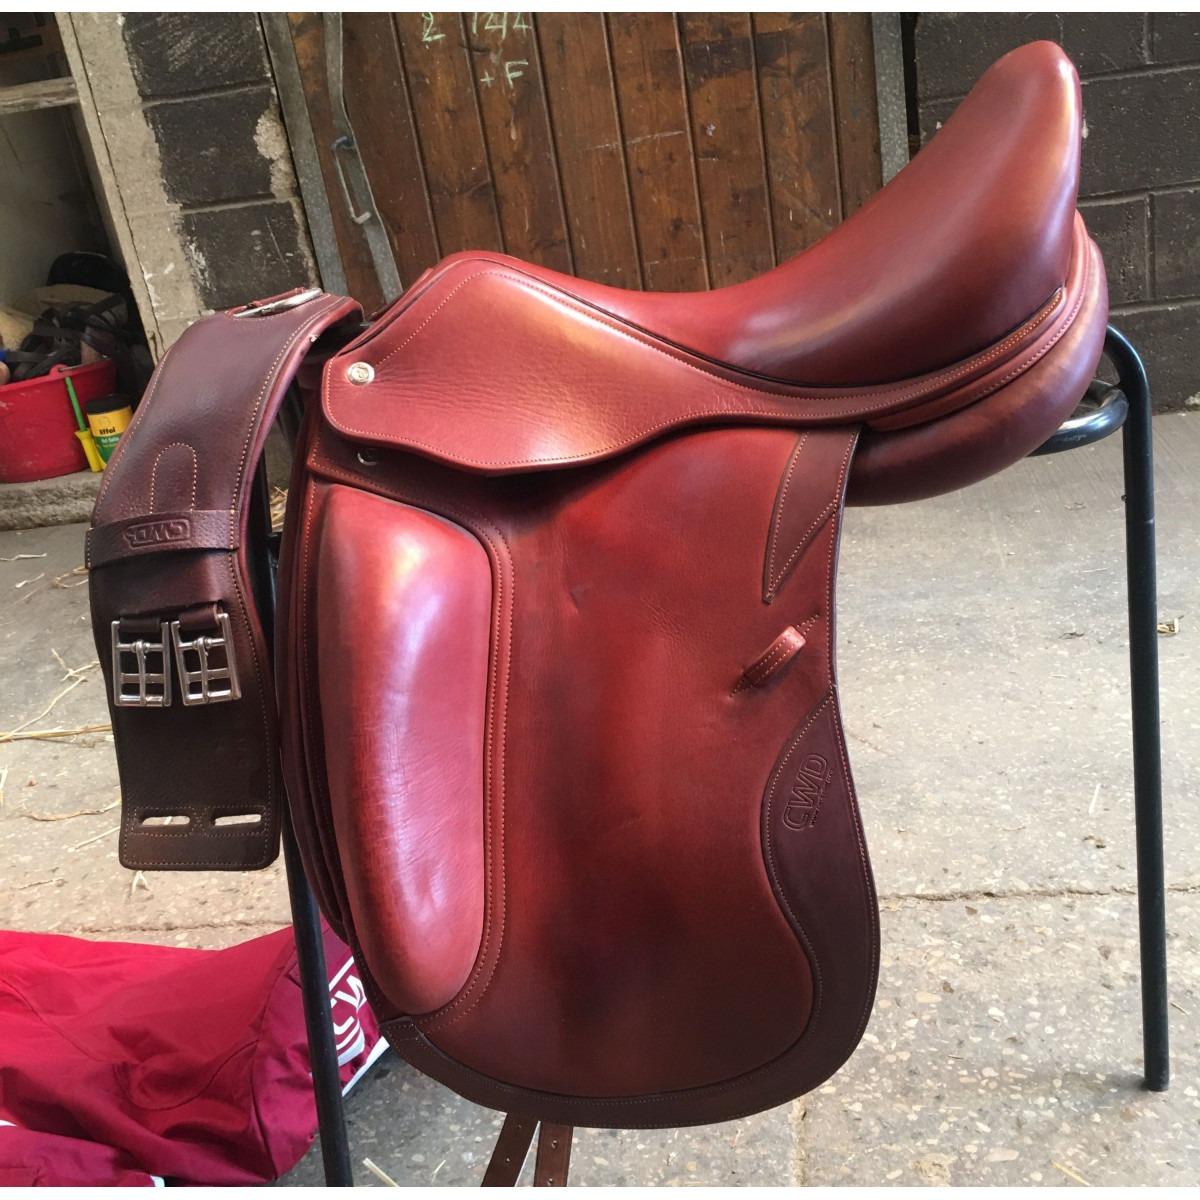 Les Marques de cuir fabrication in France